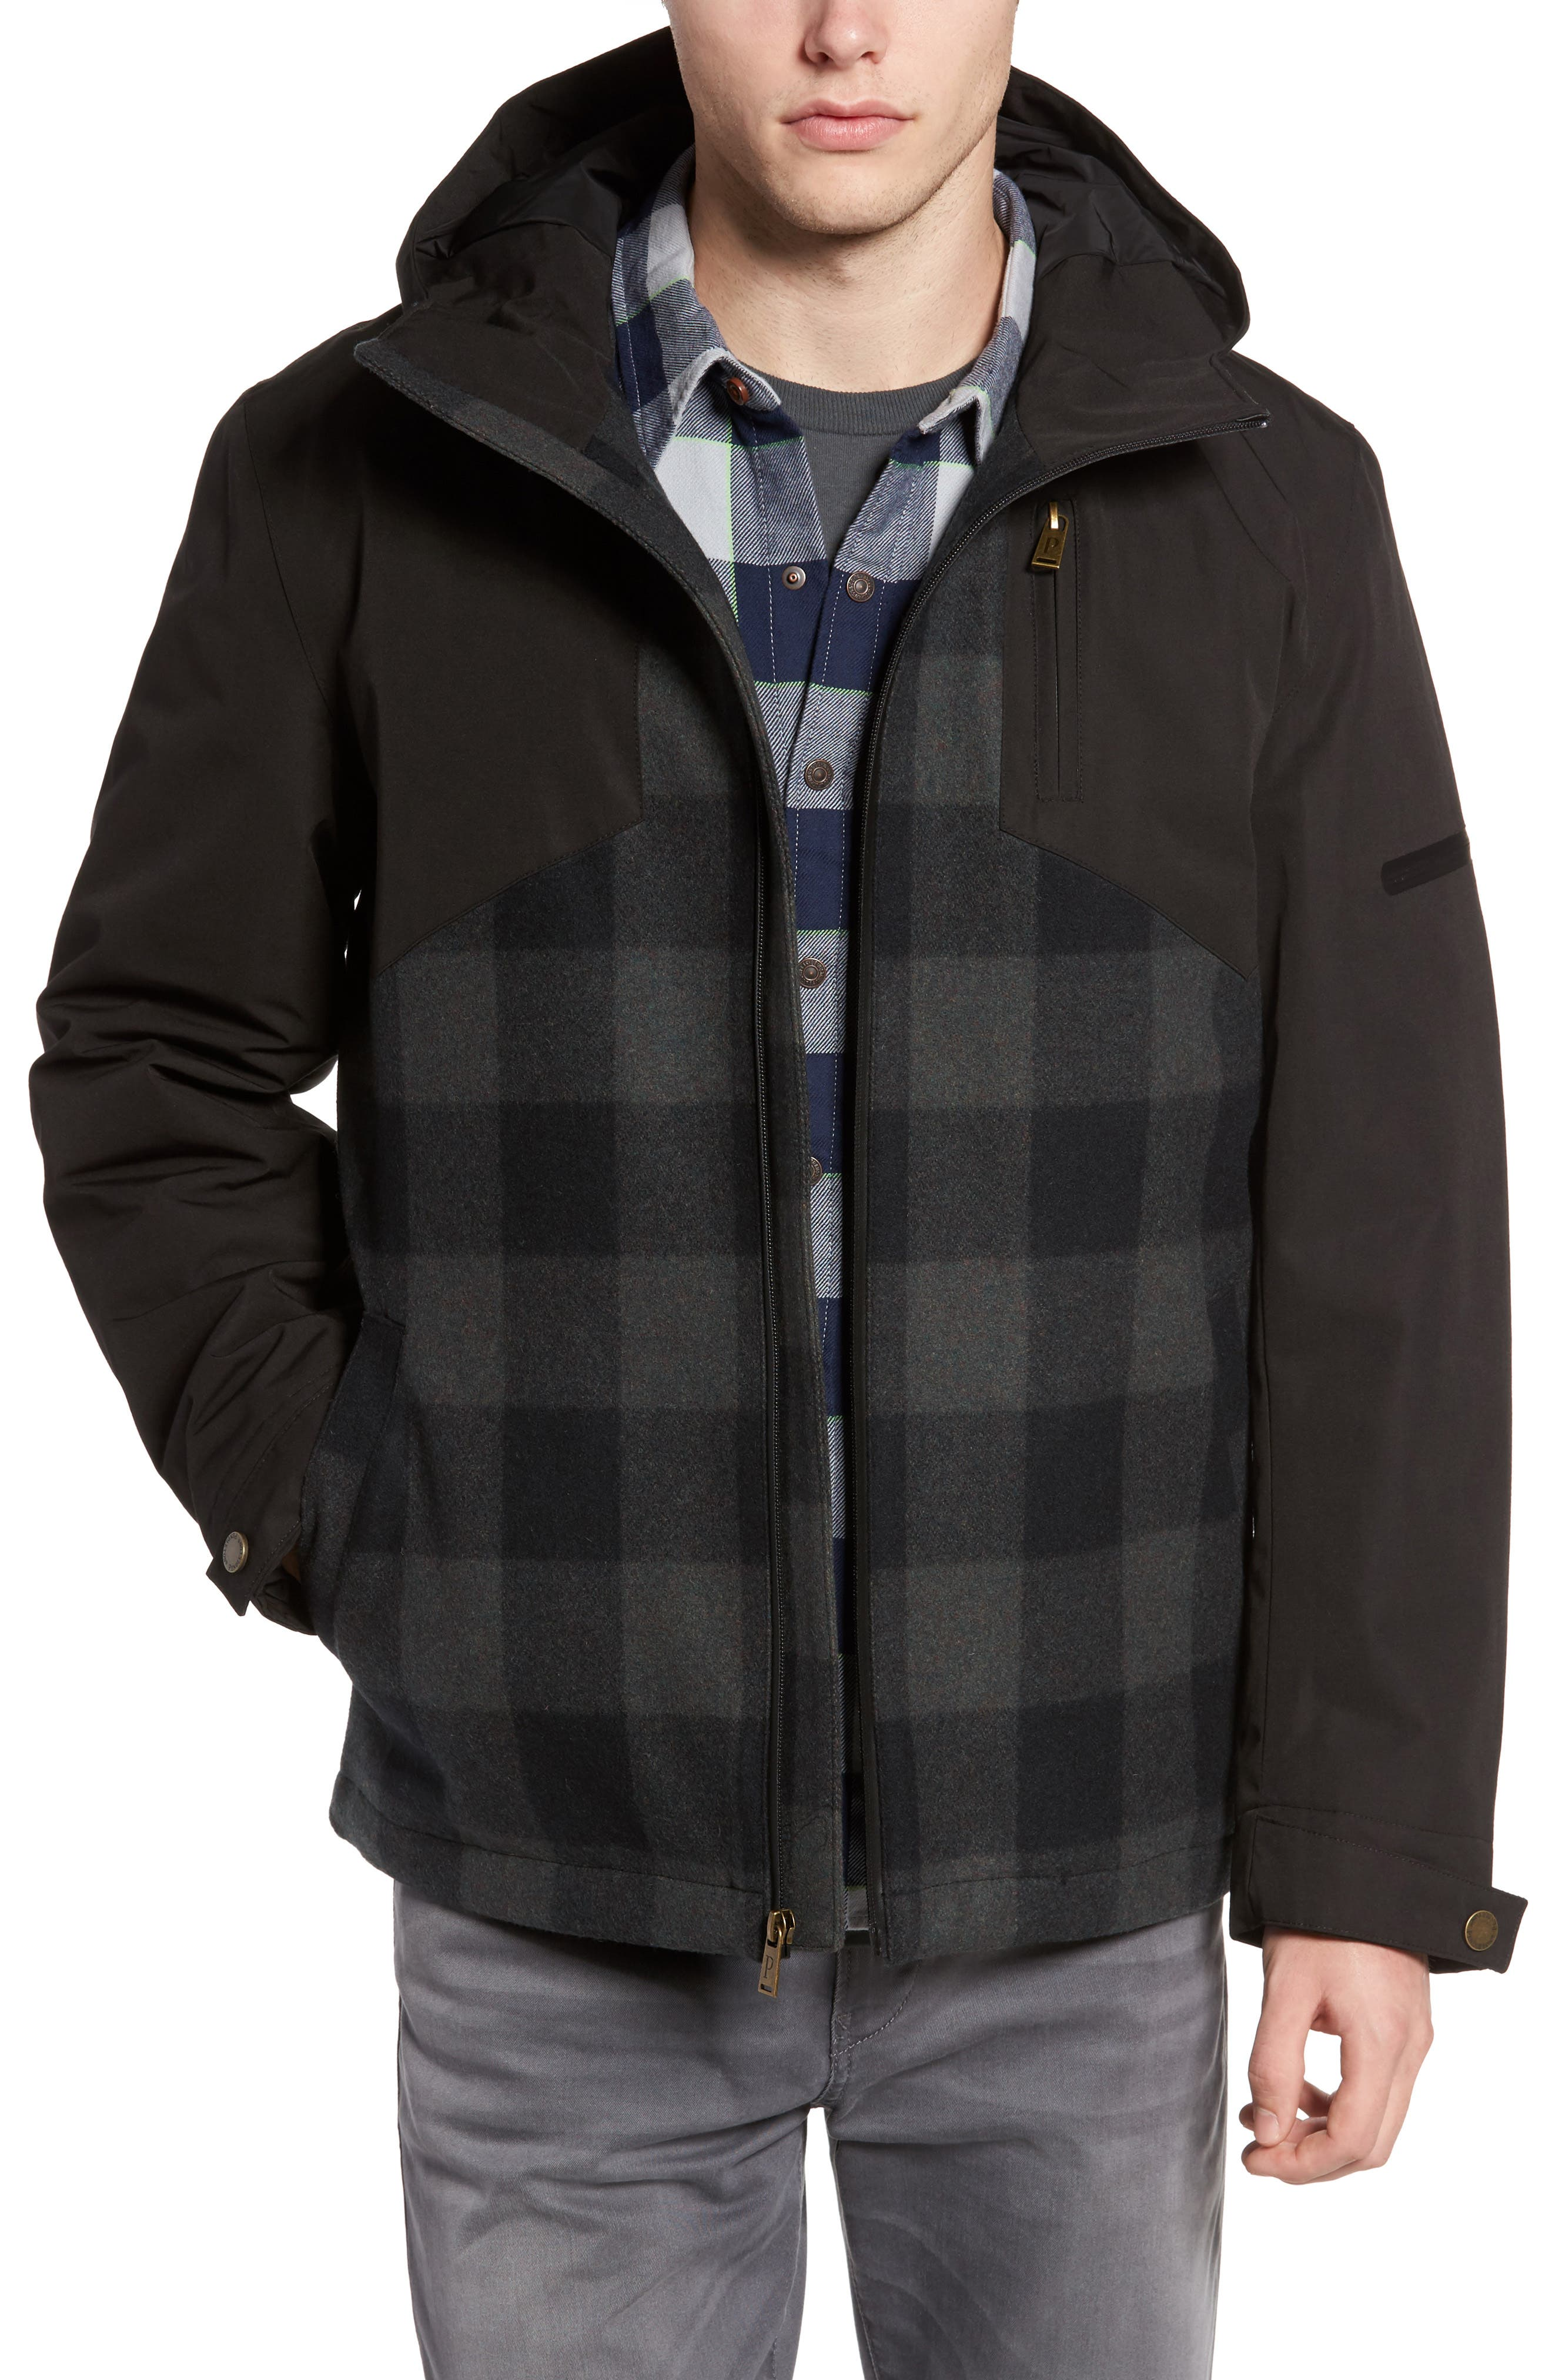 Alternate Image 1 Selected - Pendleton Jackson Hole Waterproof Hooded Jacket